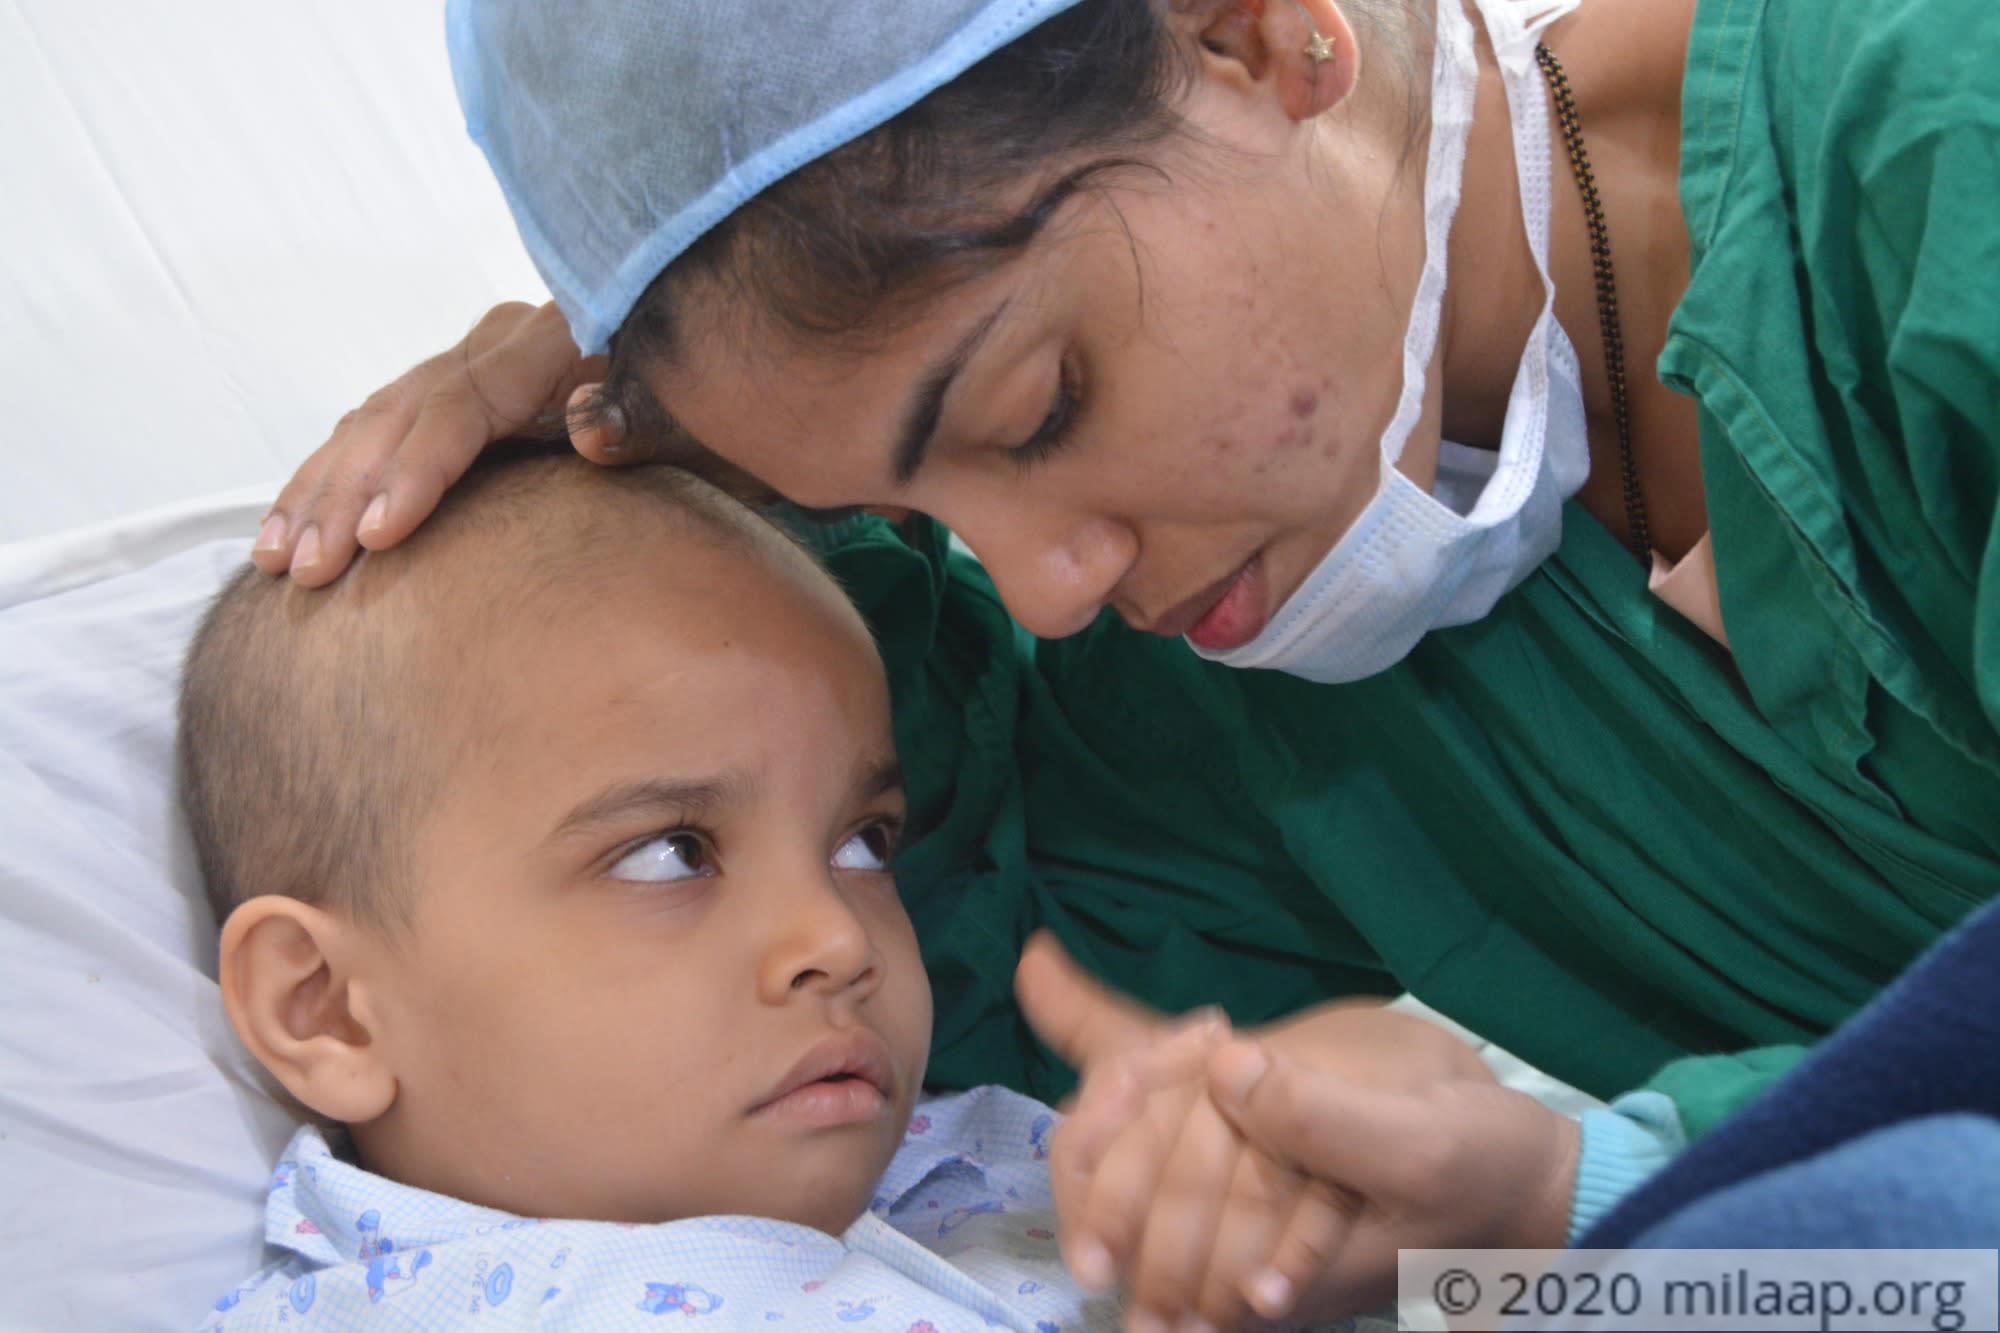 Aarush surya hospital 21 abyu4m 1574139345